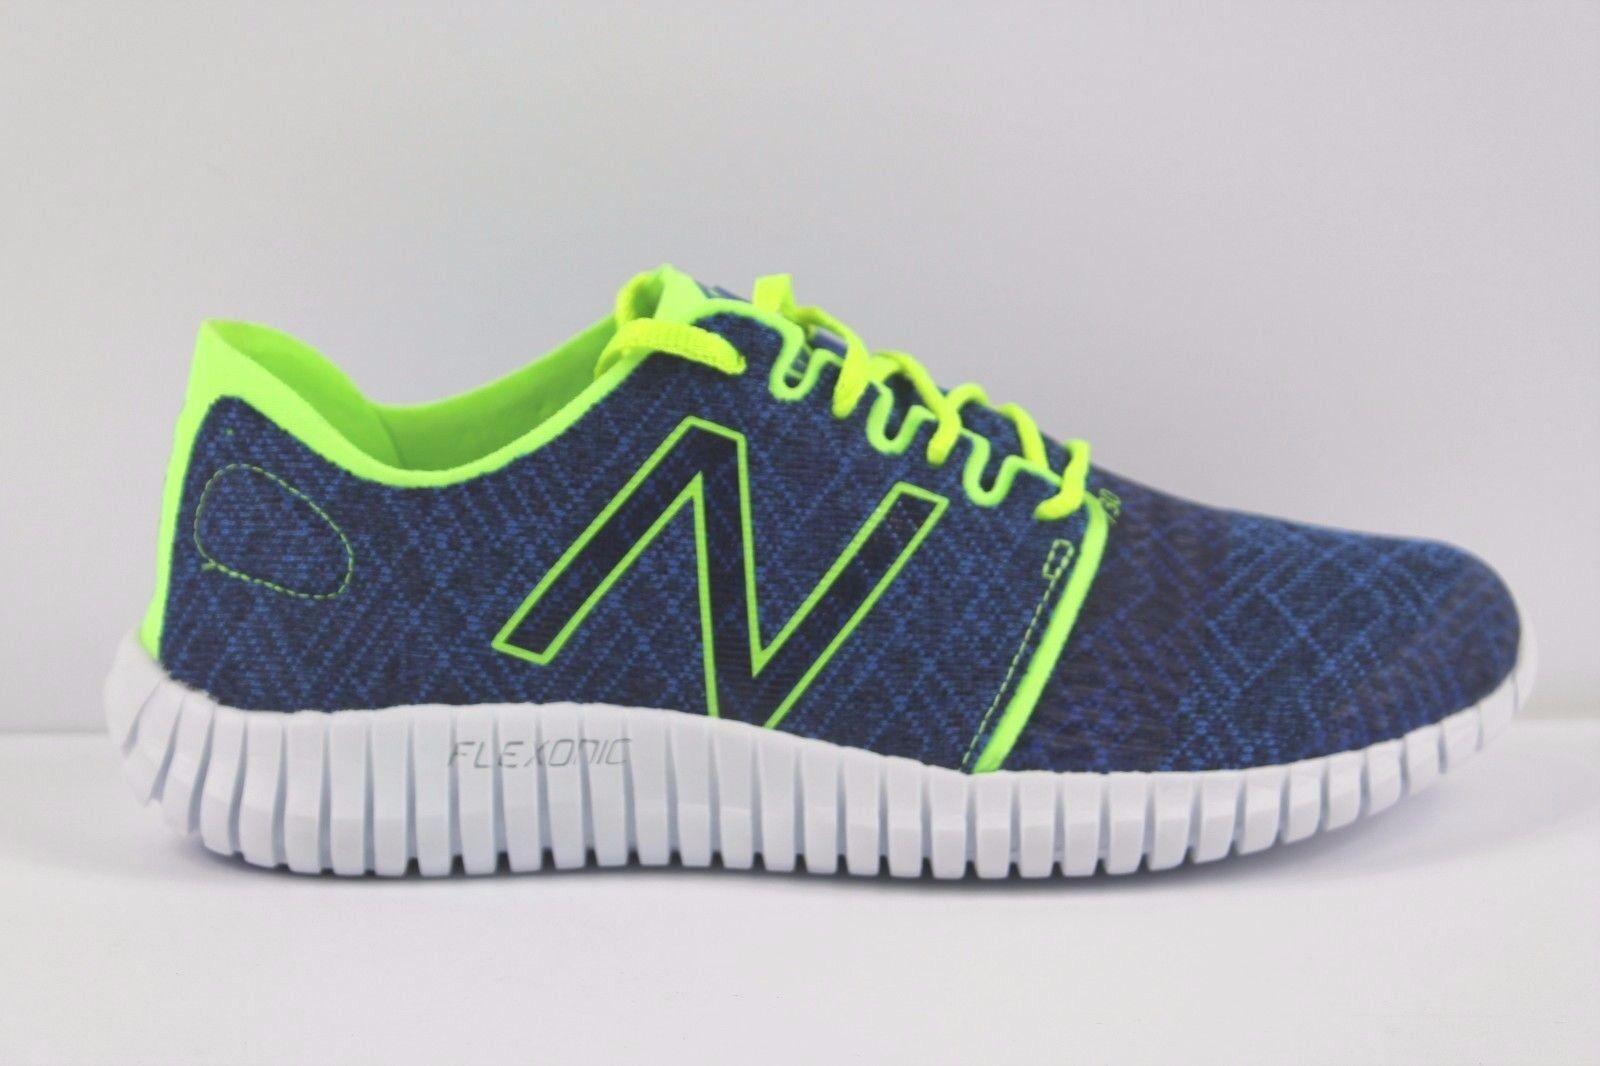 Mens New Balance M730LP3 730 Neutral Cushion Running Shoes Blue Green White